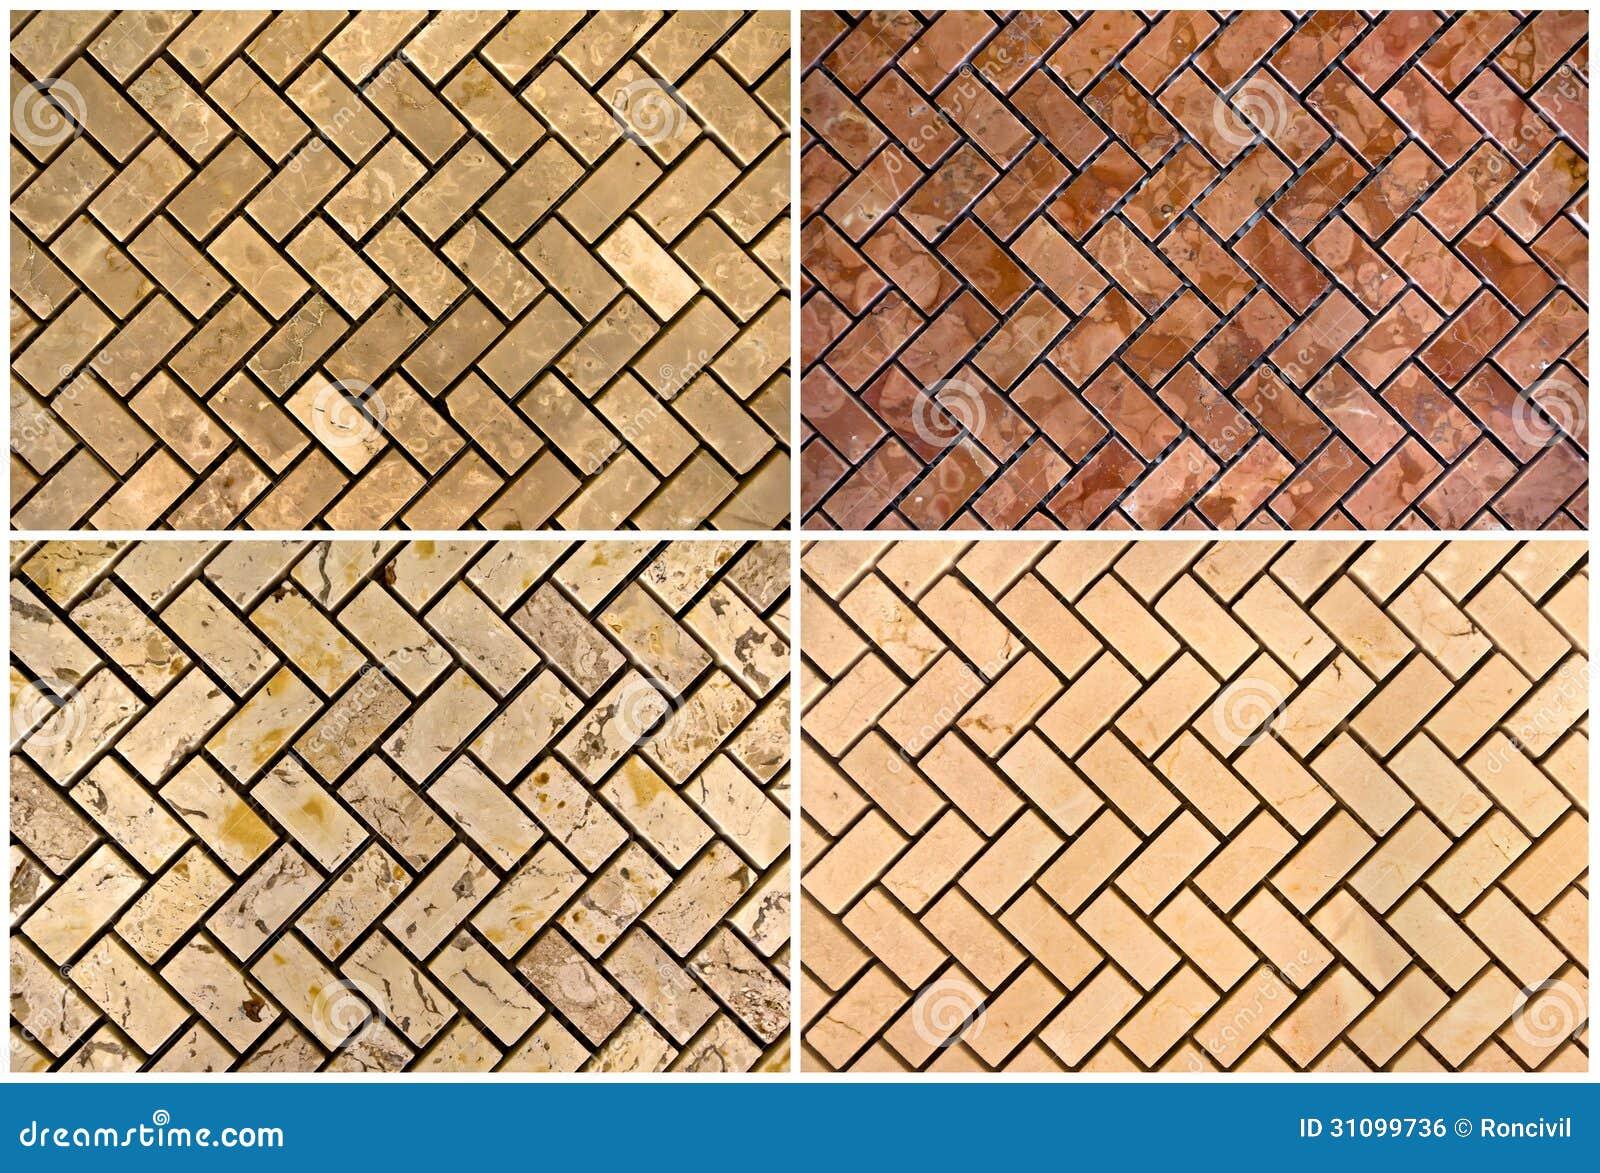 Mosaic Tile As Interior Elements : Mosaic Tile As Interior Elements : Mosaic Tile for Exterior Building